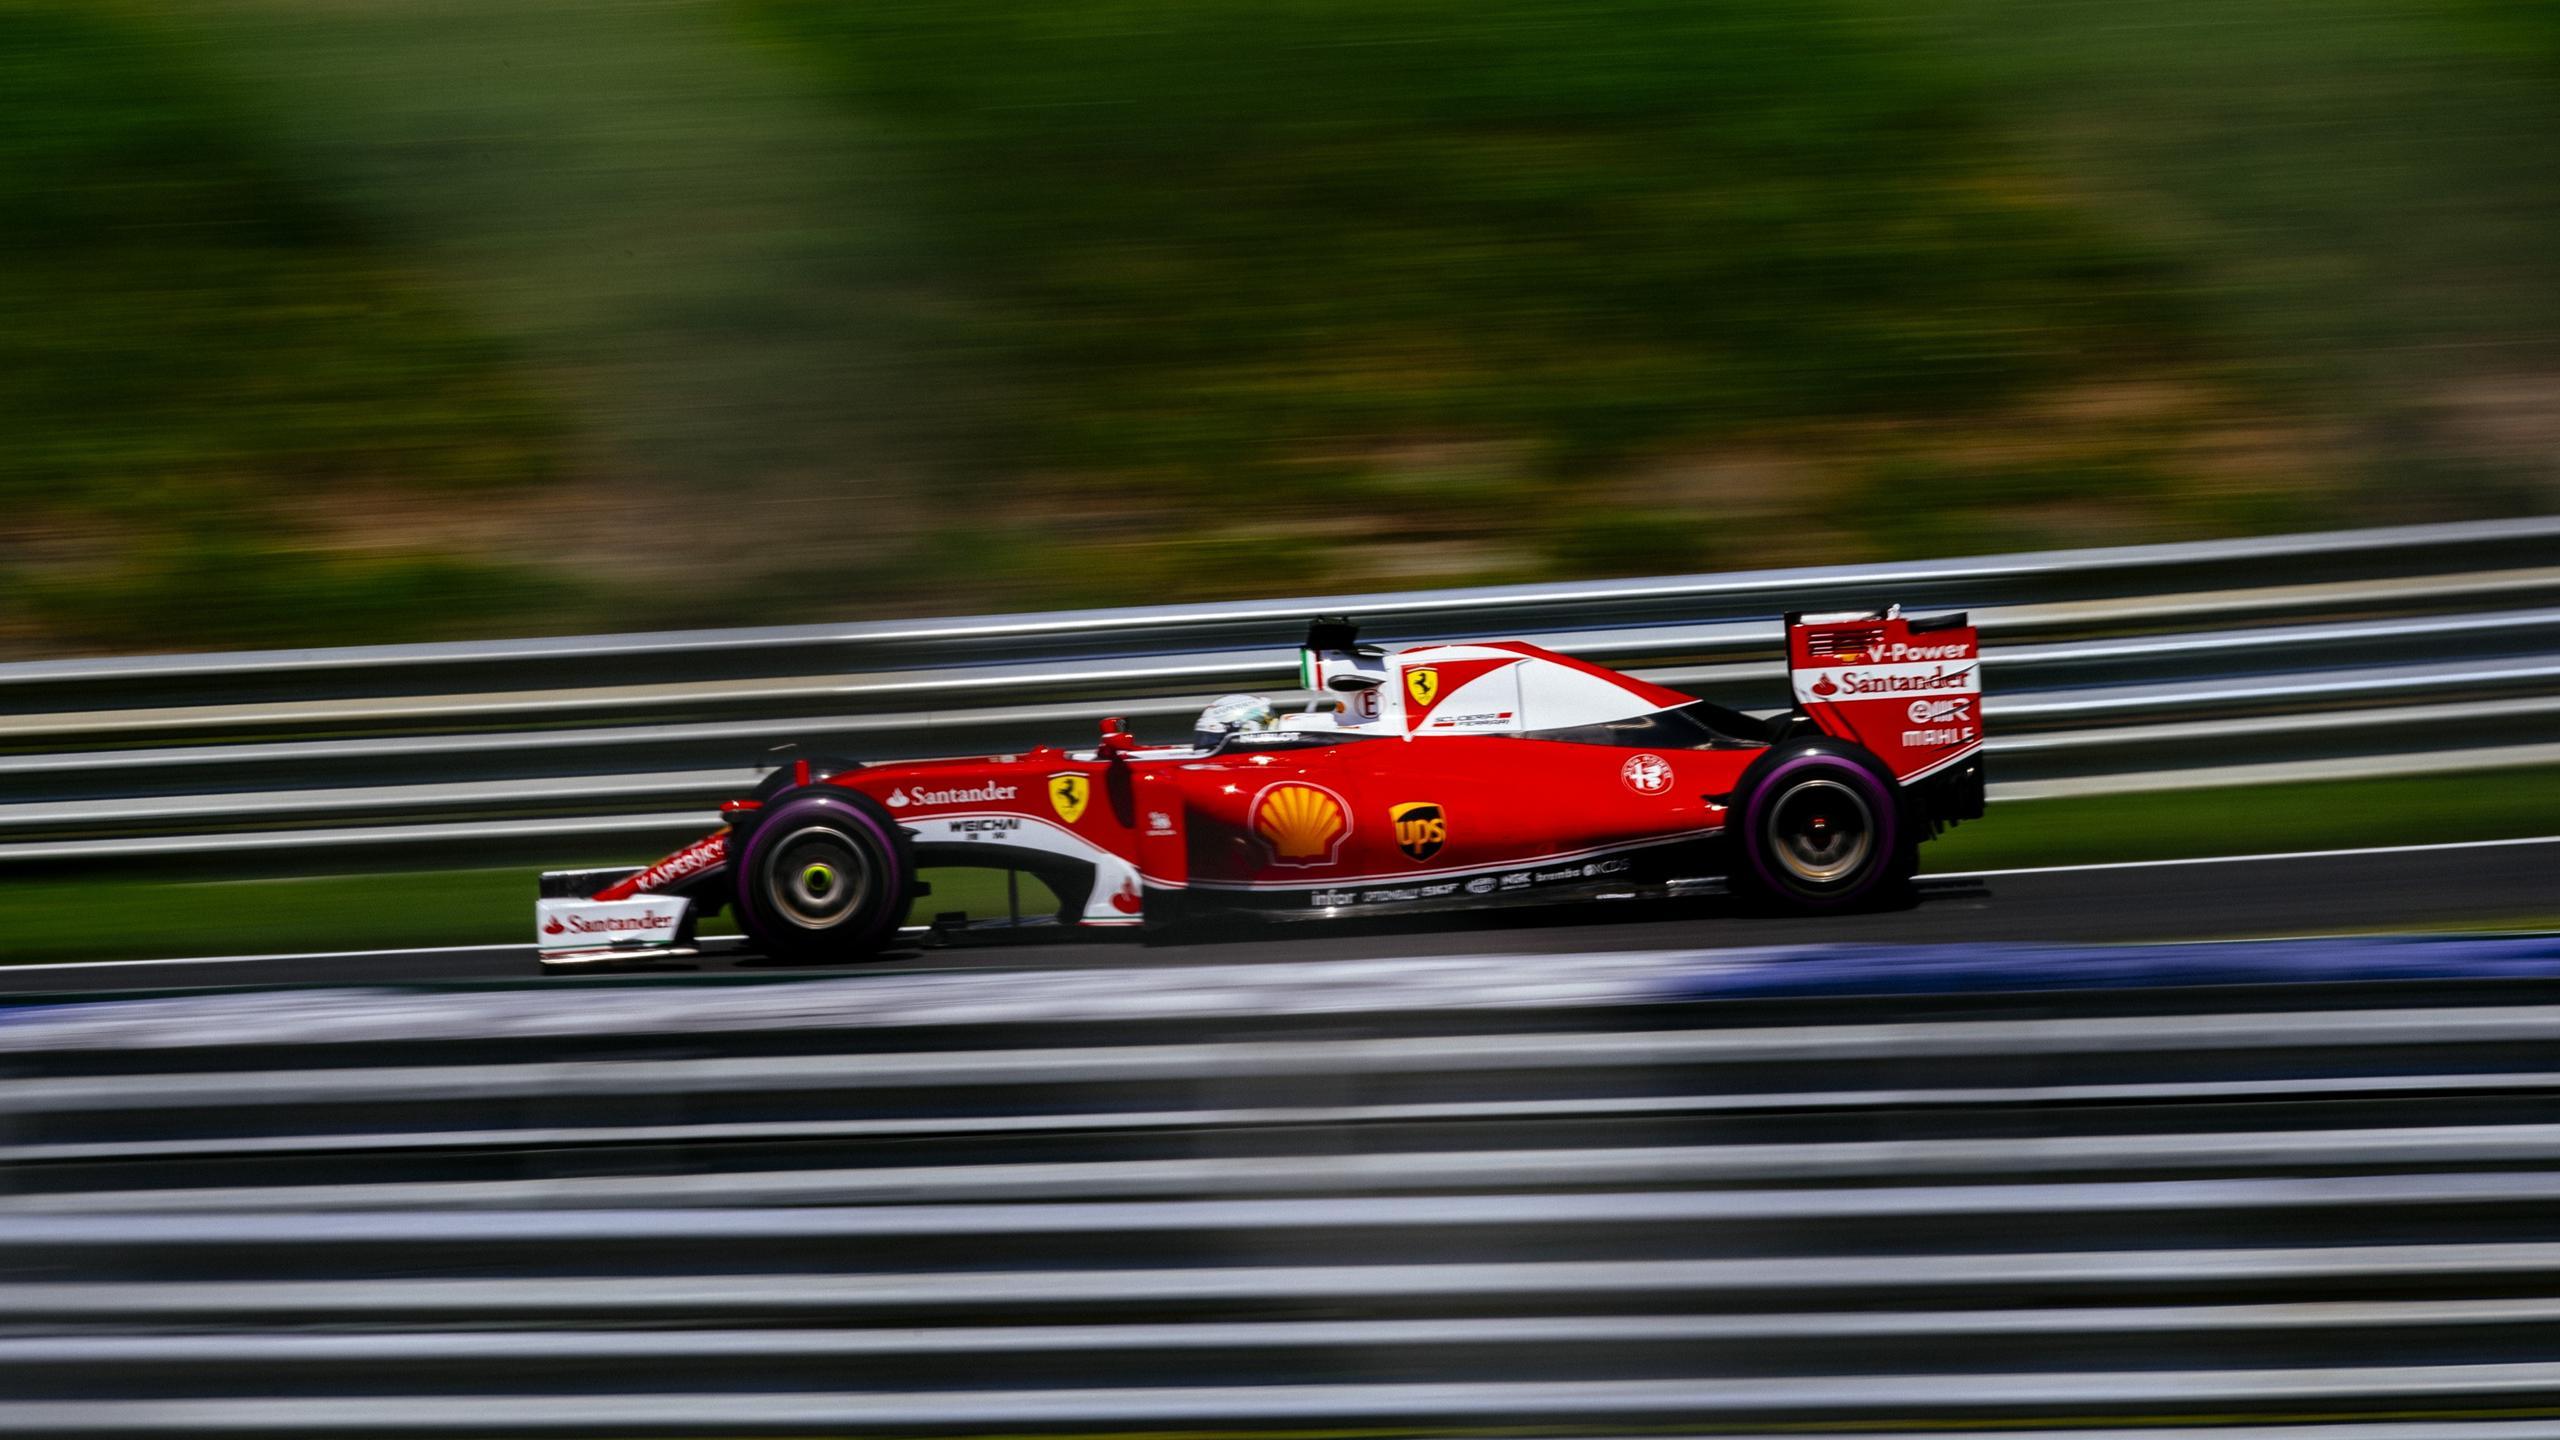 Sebastian Vettel (Ferrari) - GP of Austria 2016